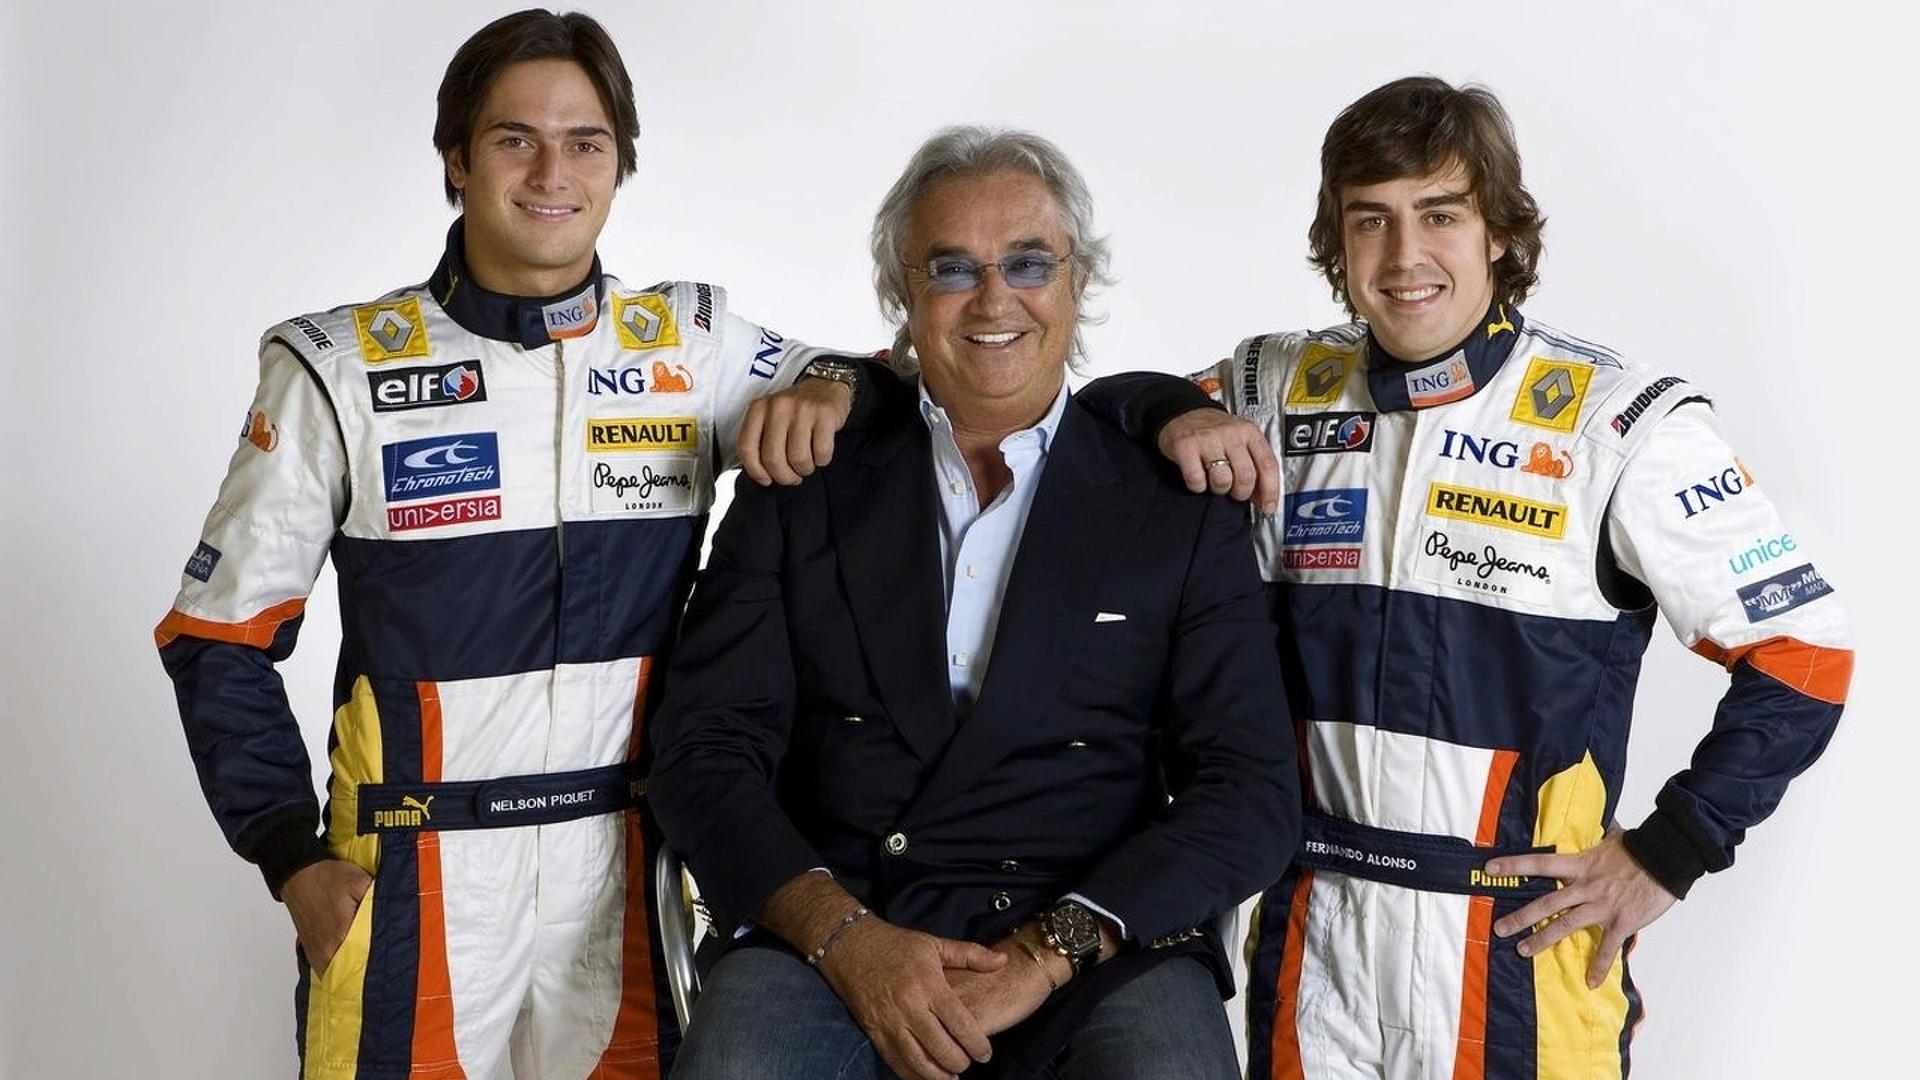 Renault, Piquet do not comment on crash cheat claims